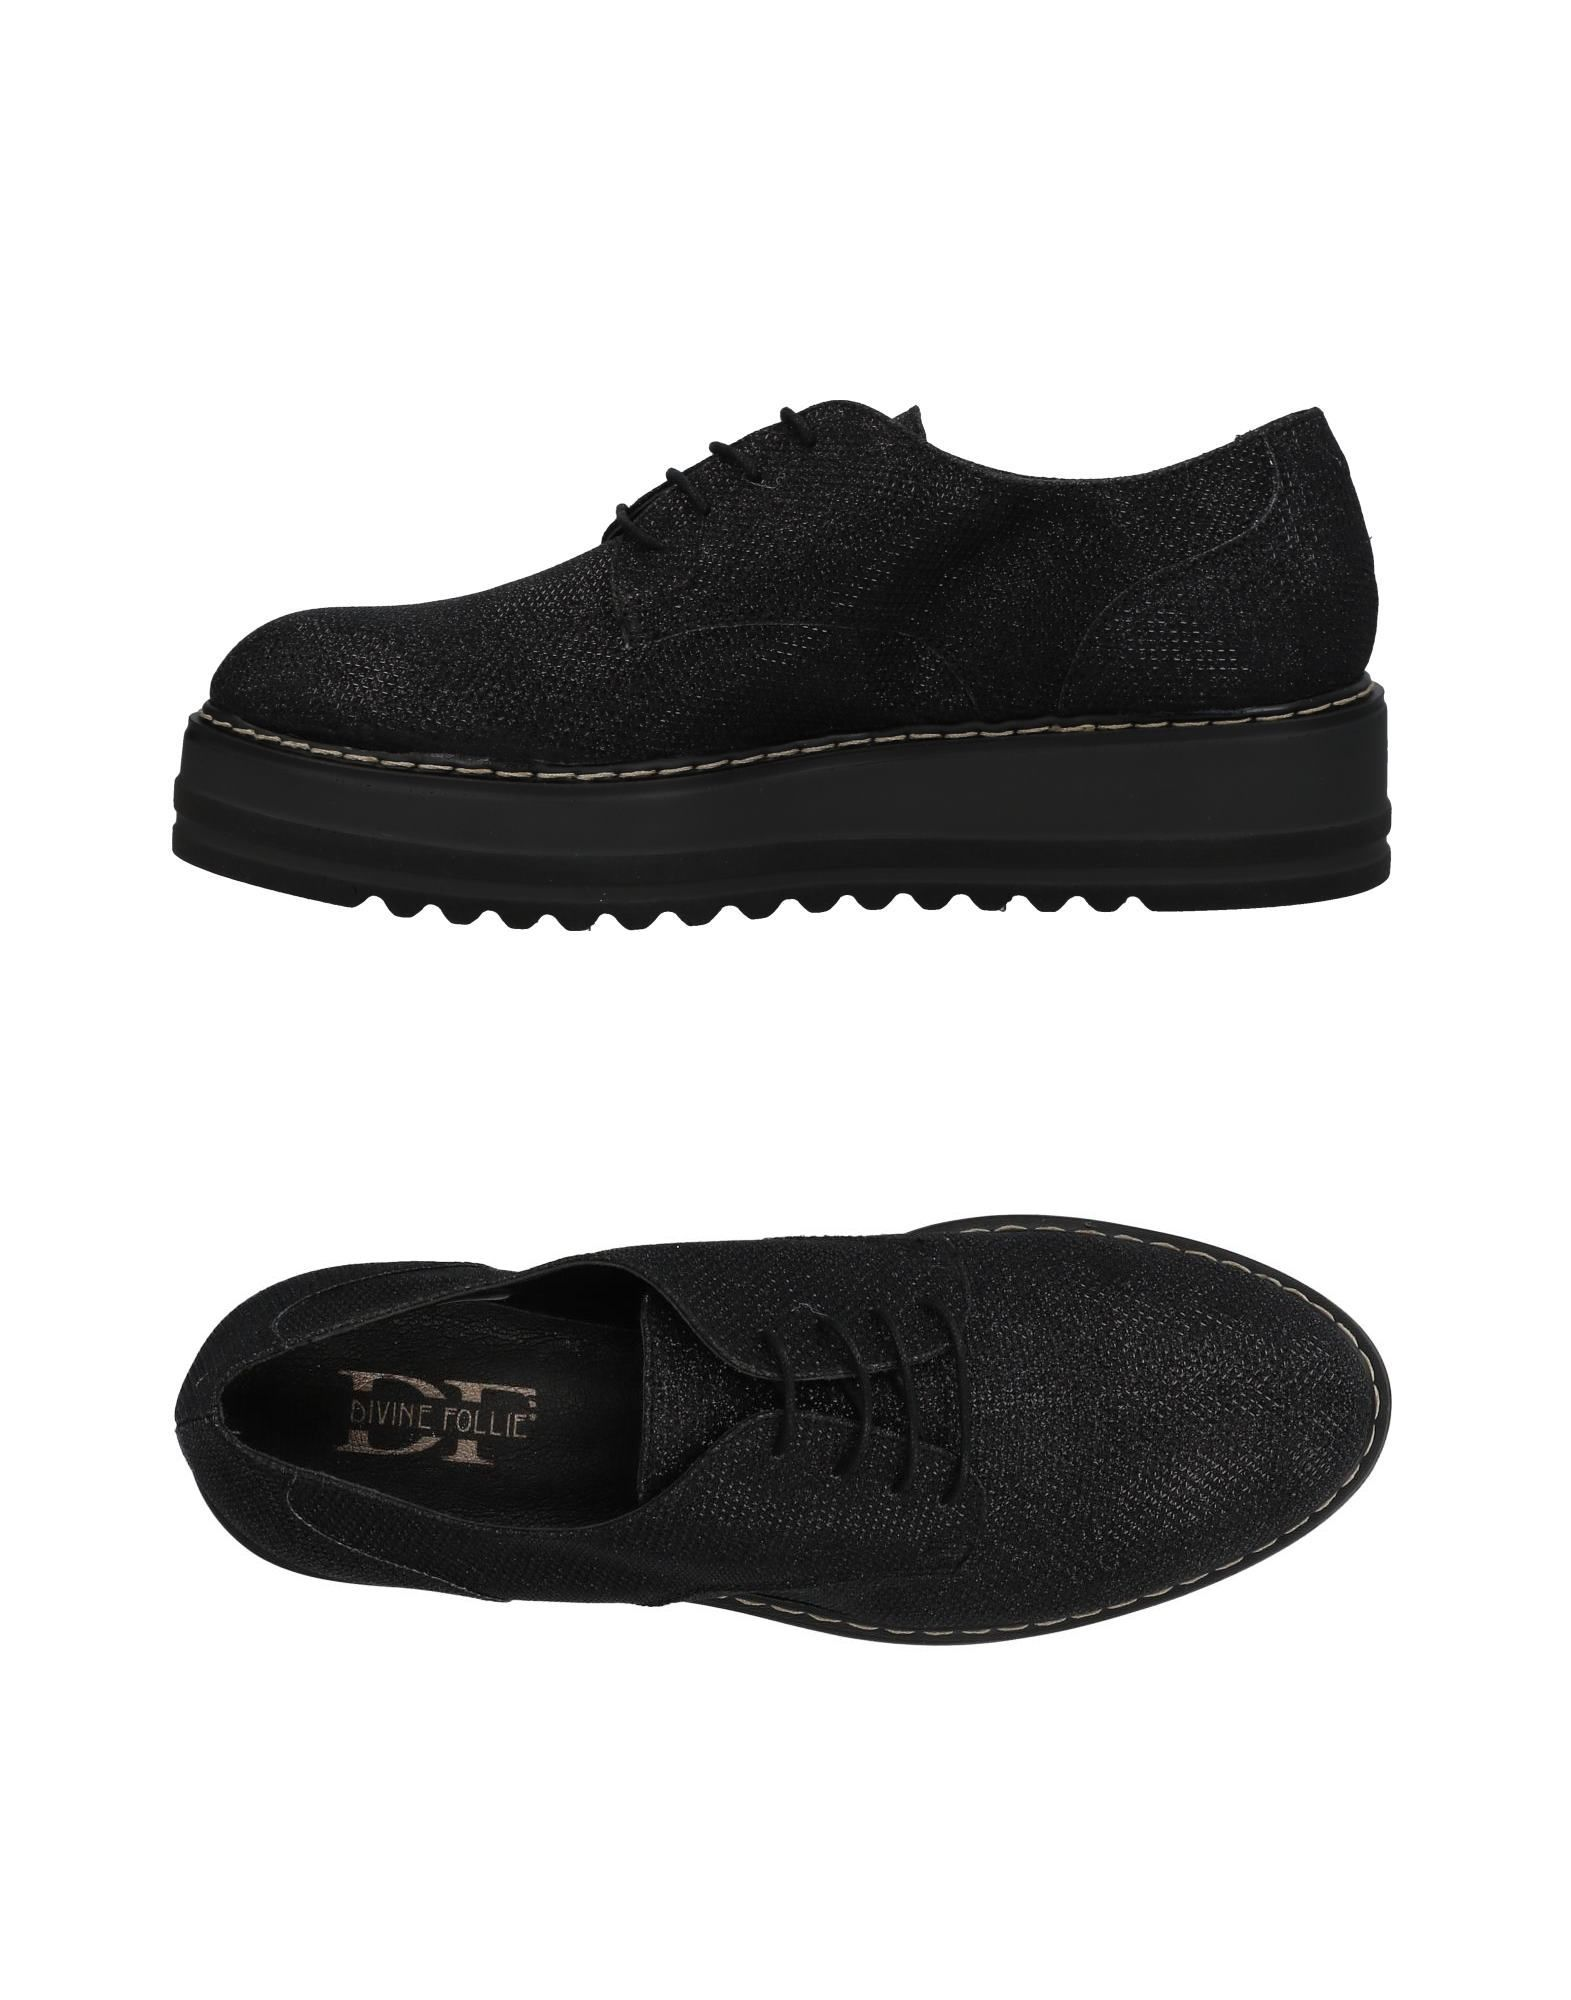 DIVINE FOLLIE Обувь на шнурках цены онлайн